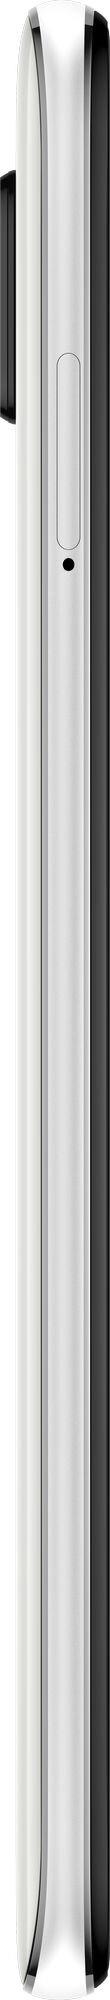 Xiaomi Redmi Note 9 Pro 6/128GB White - 5